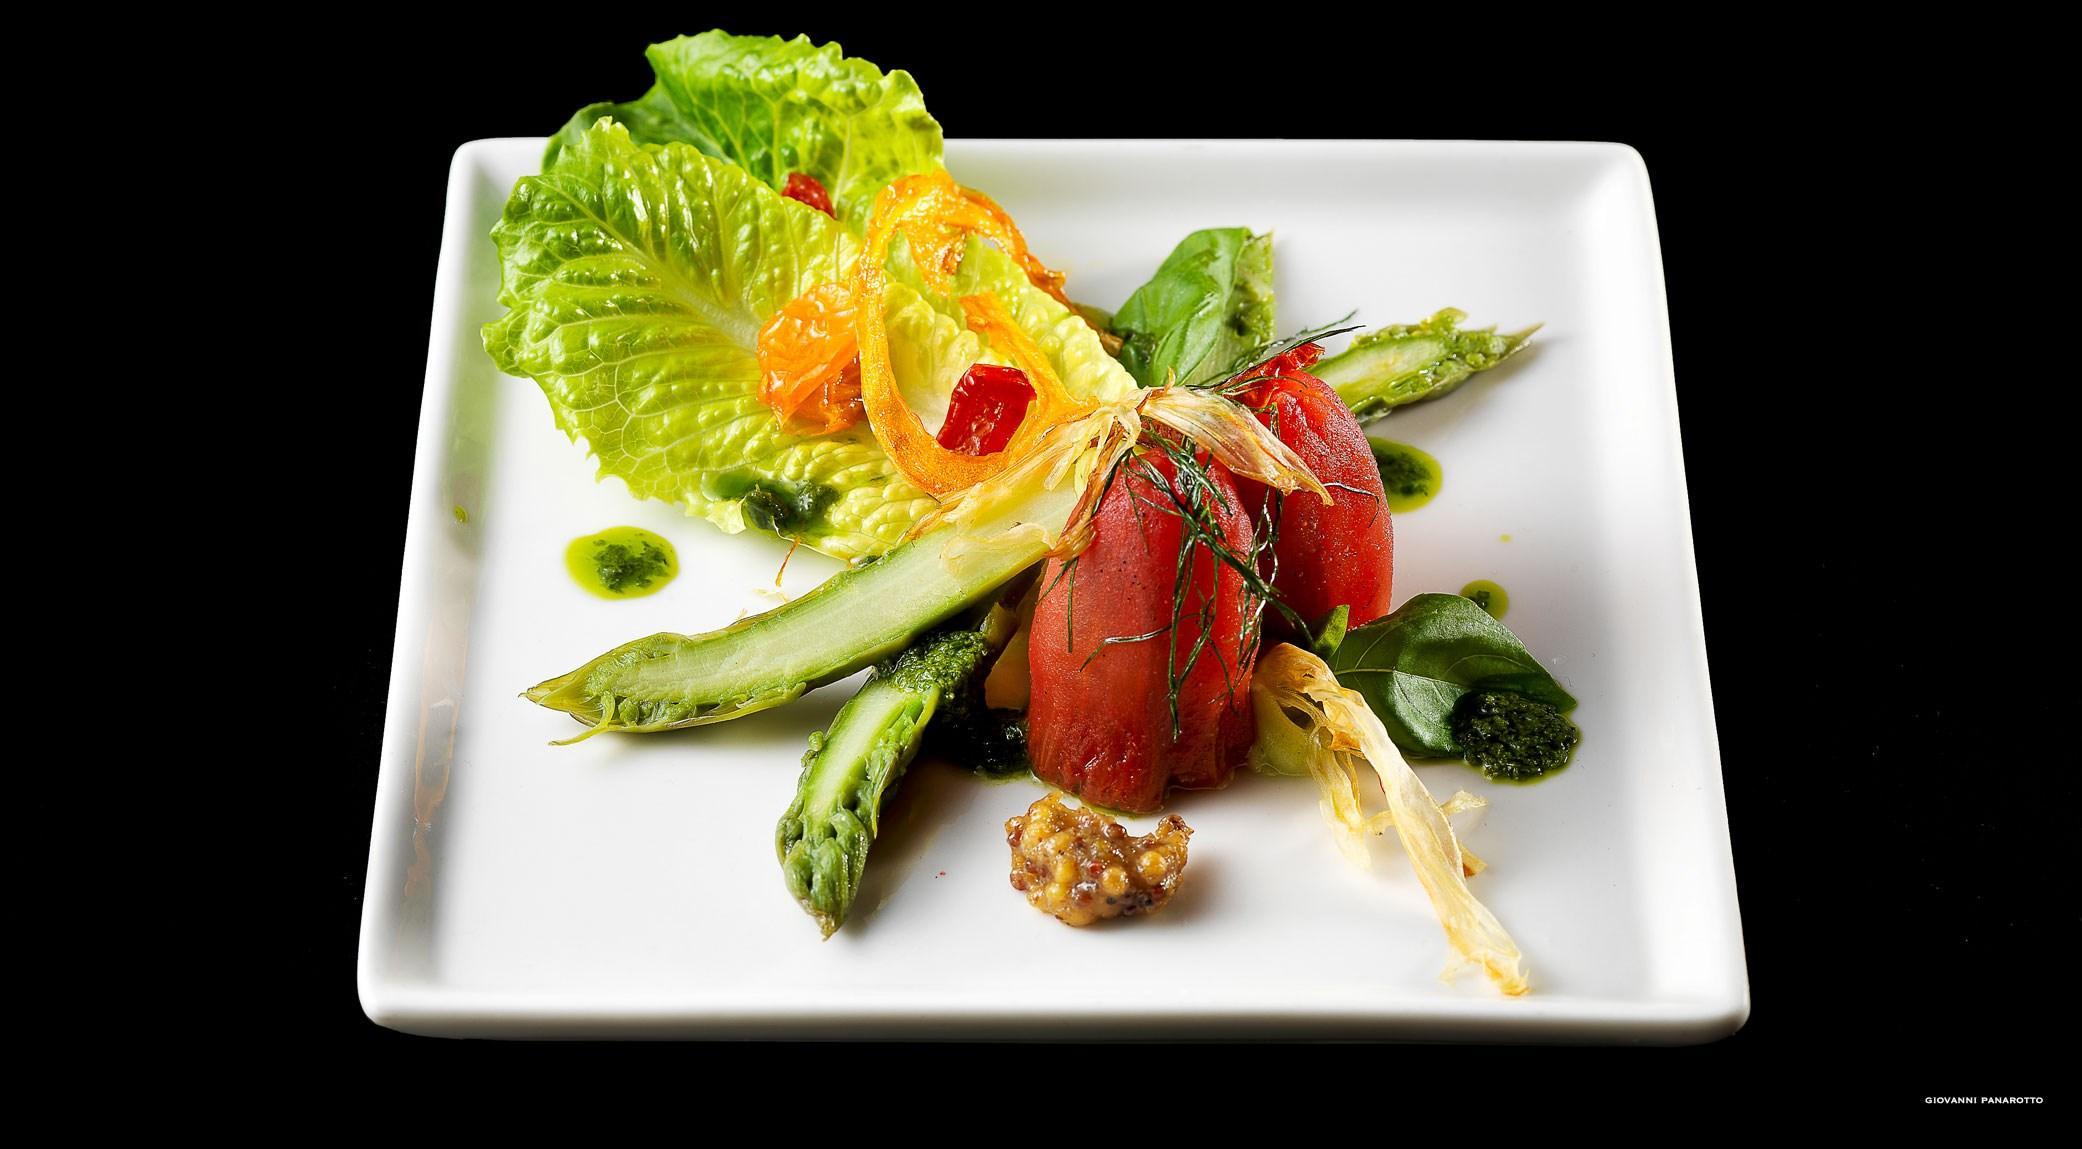 015-tomato-salad-ramsay